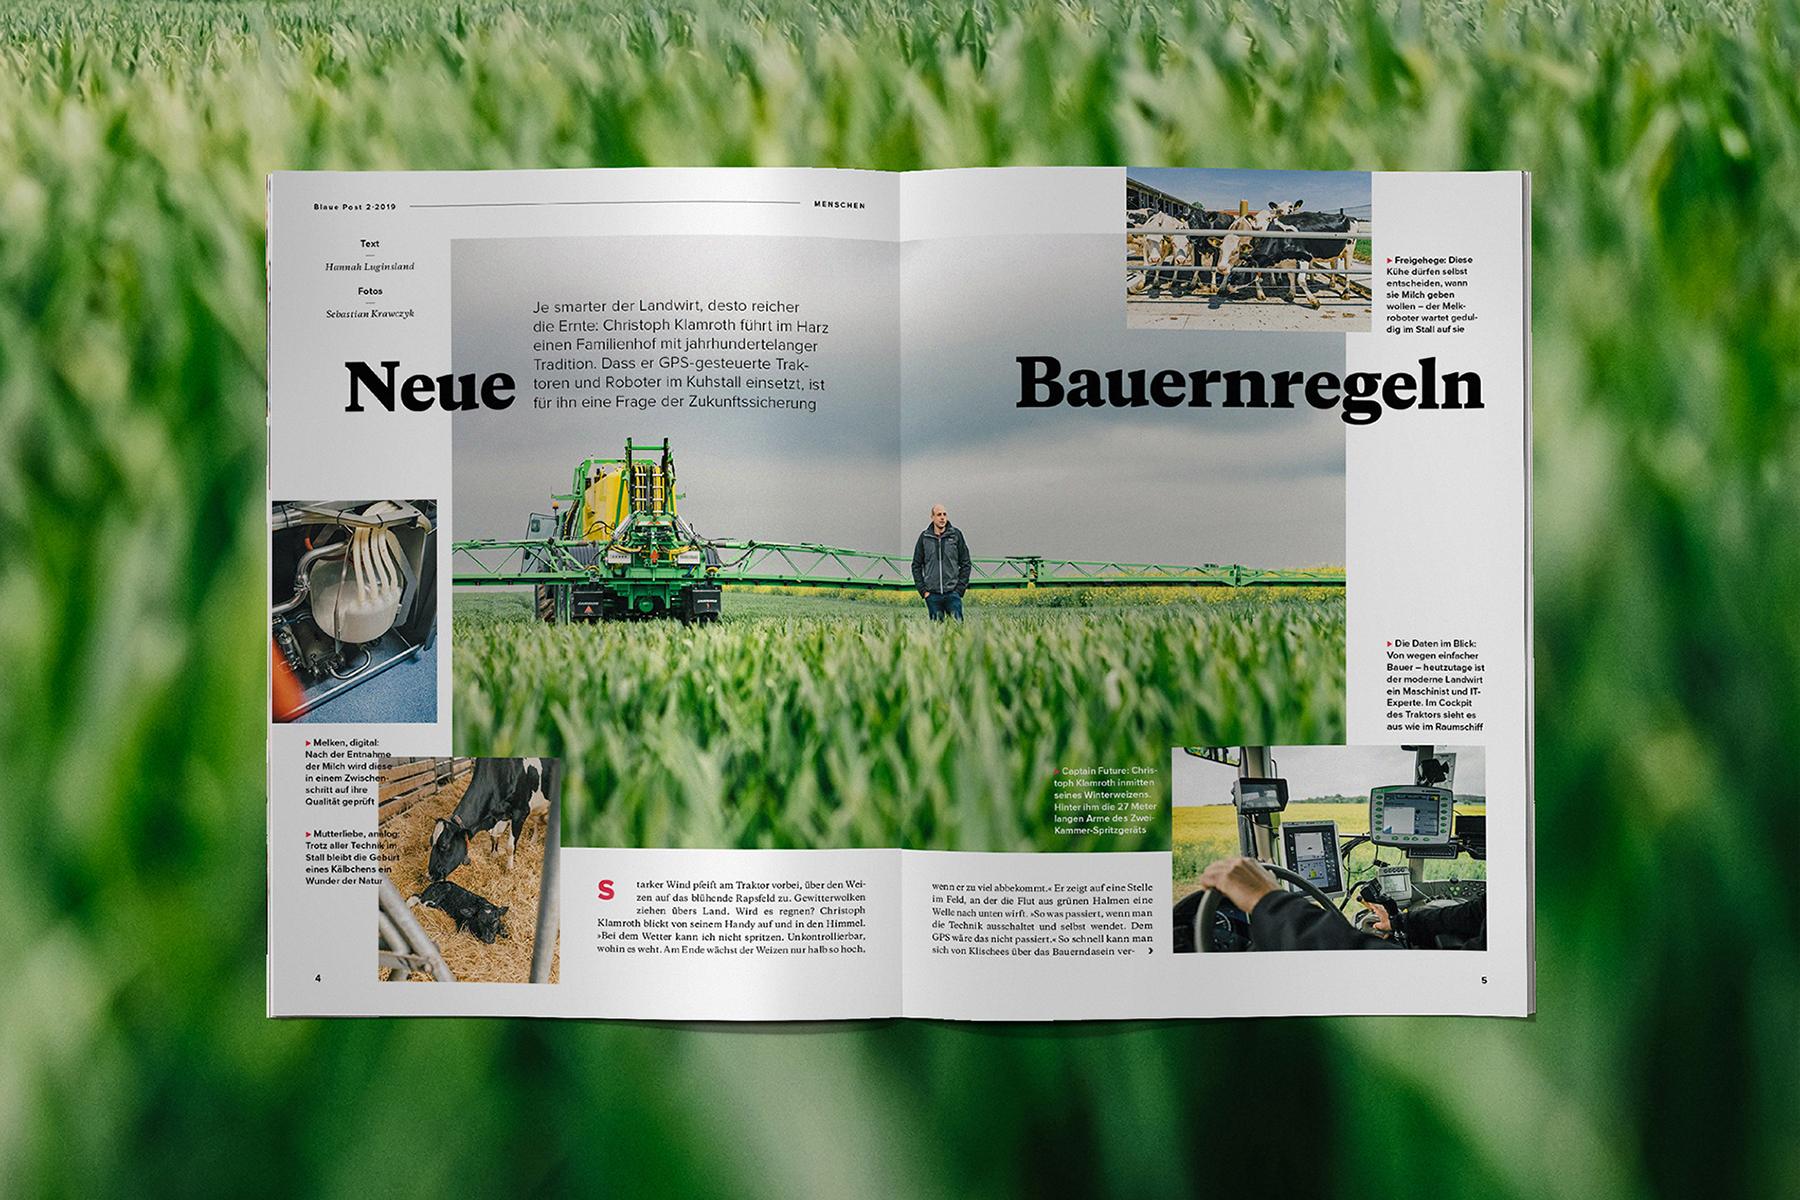 IAN_BP_Landwirt_1440_960_1800